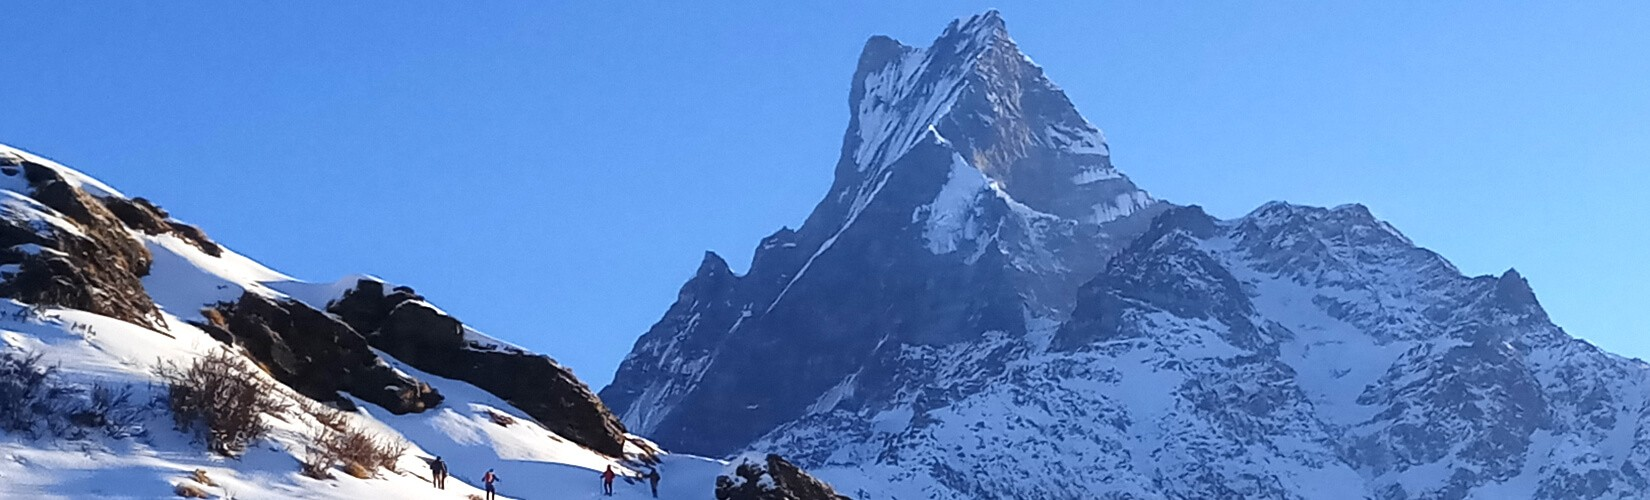 Mardi Himal Trekking | Reasonable Treks and Tour